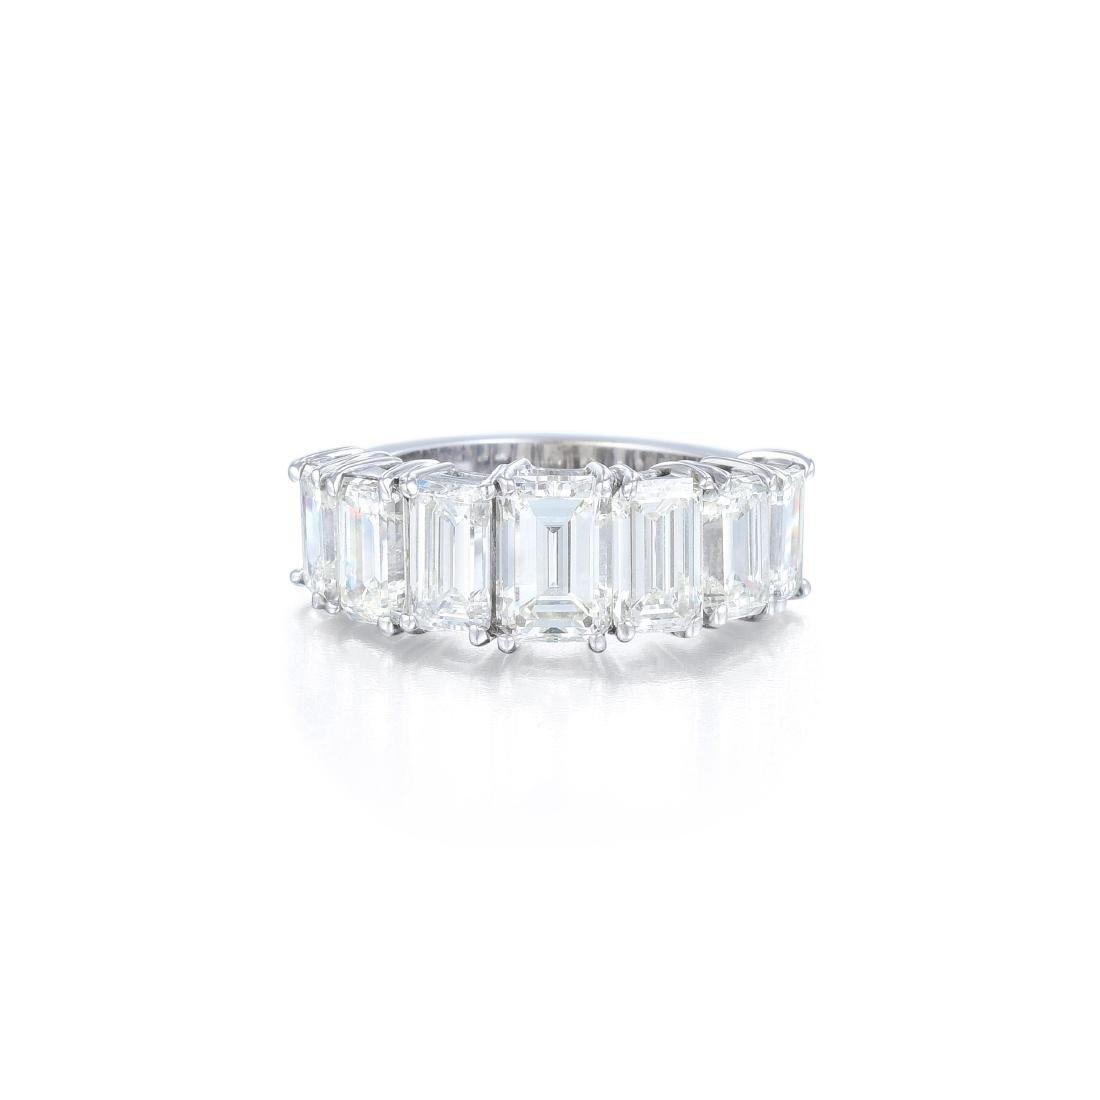 A Seven Emerald-Cut Diamond Wedding Band